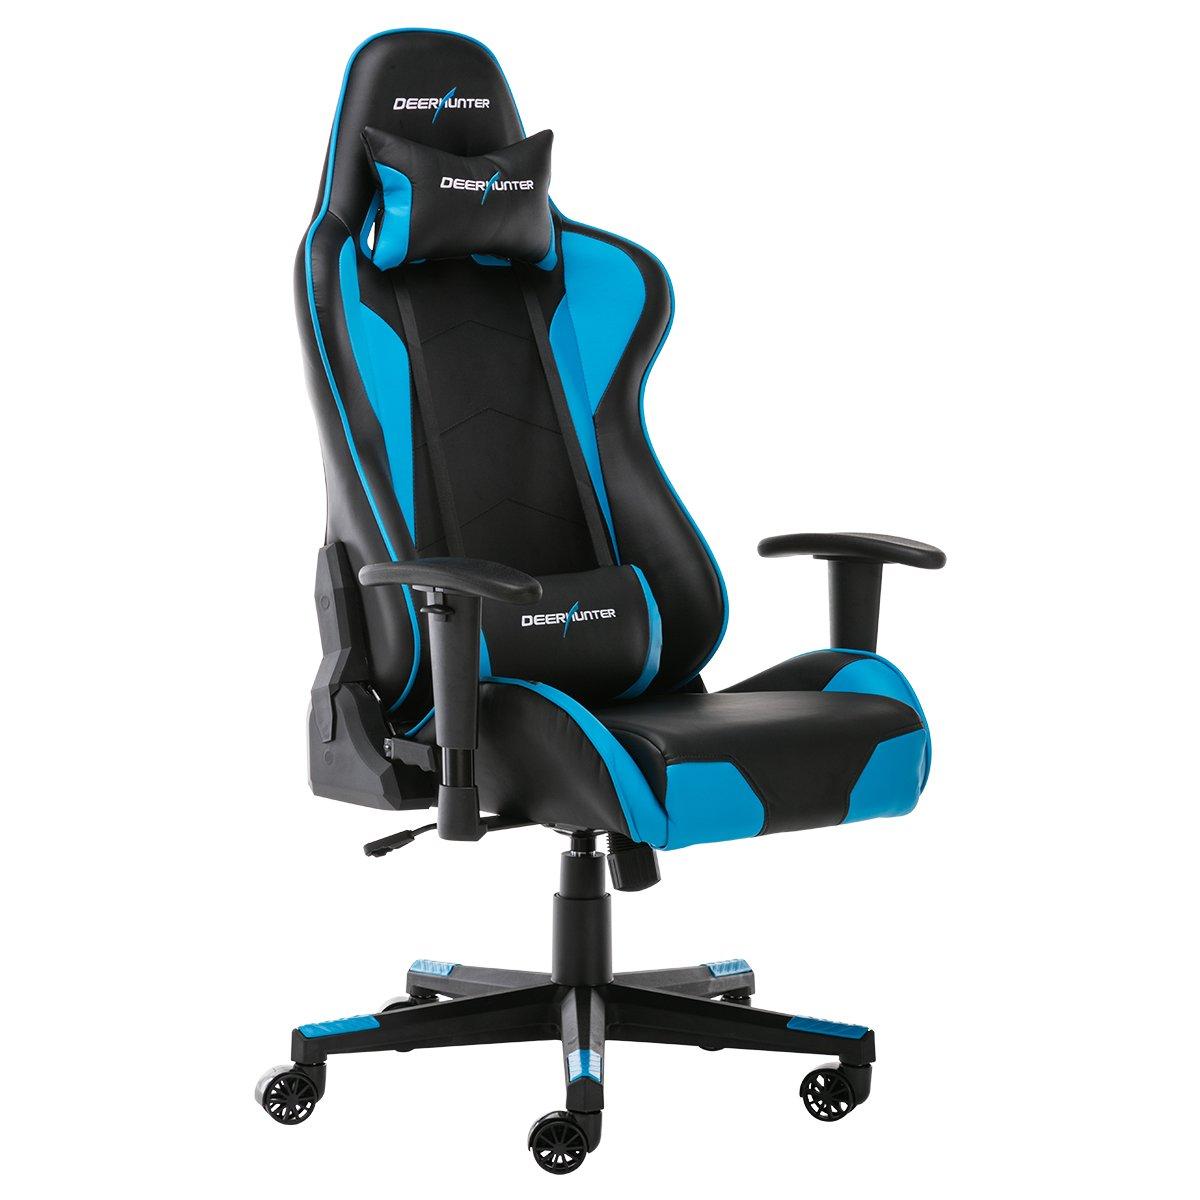 Deerhunter Gaming Chair Leather Office High Back Ergonomic Racing Adjustable Computer